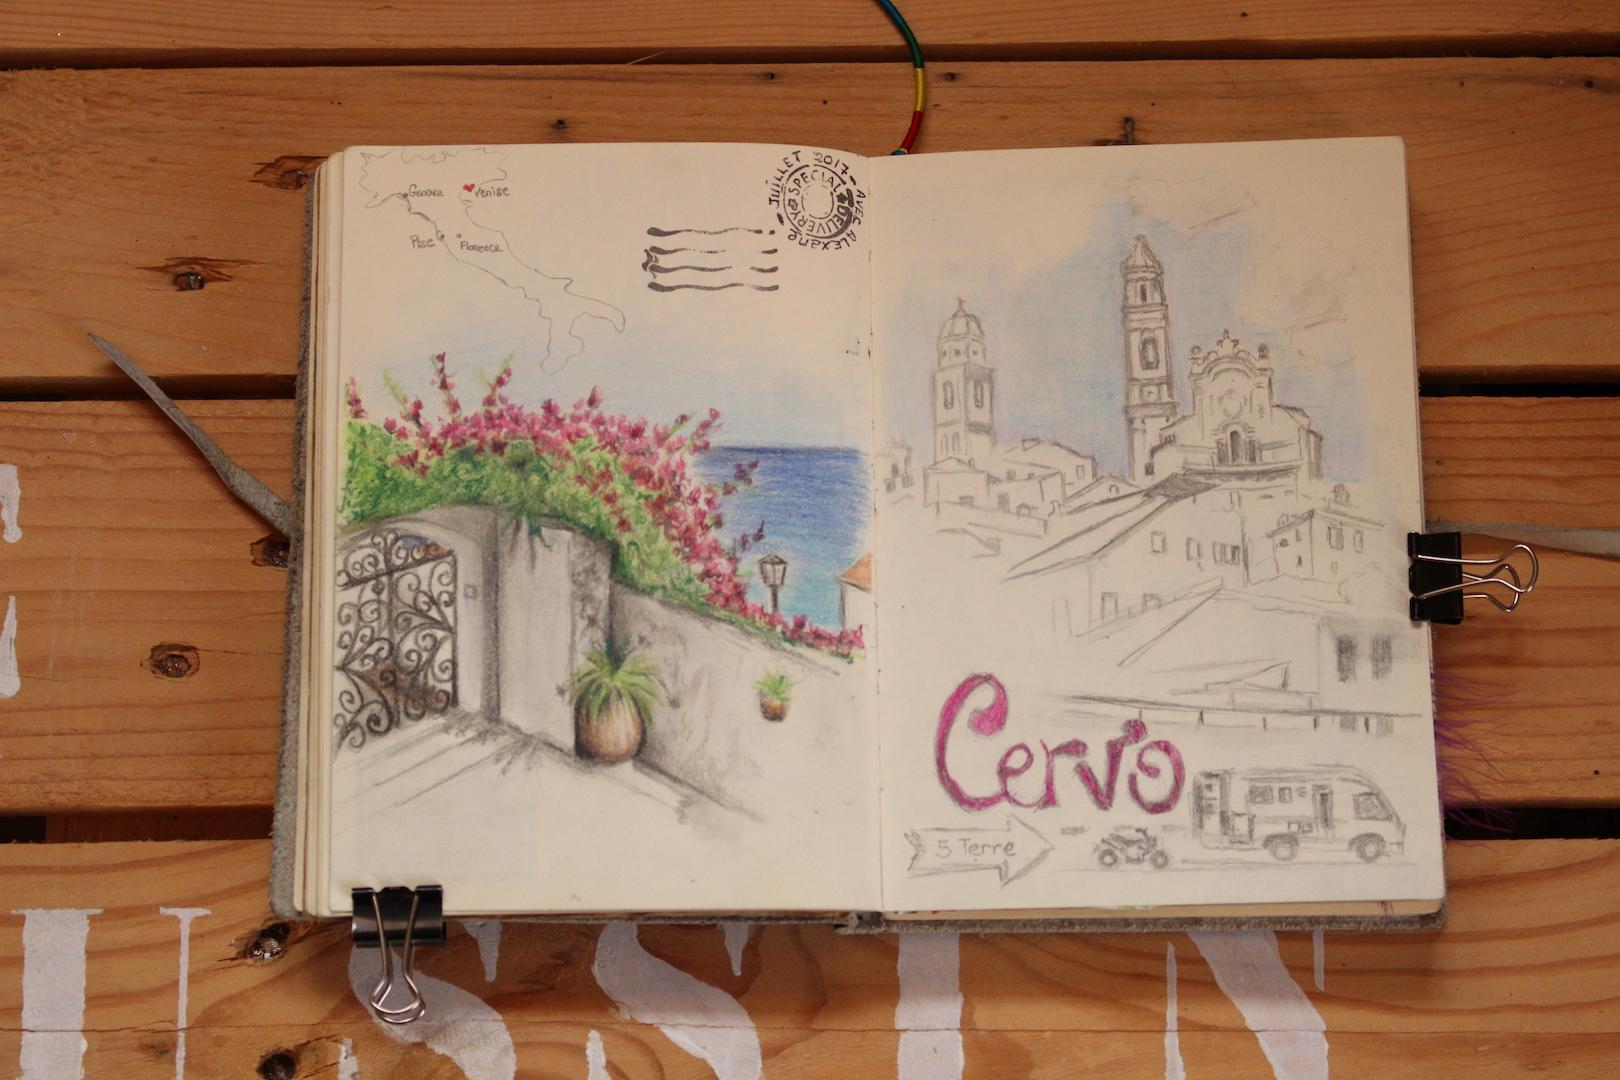 Croquis de Cervo en Italie